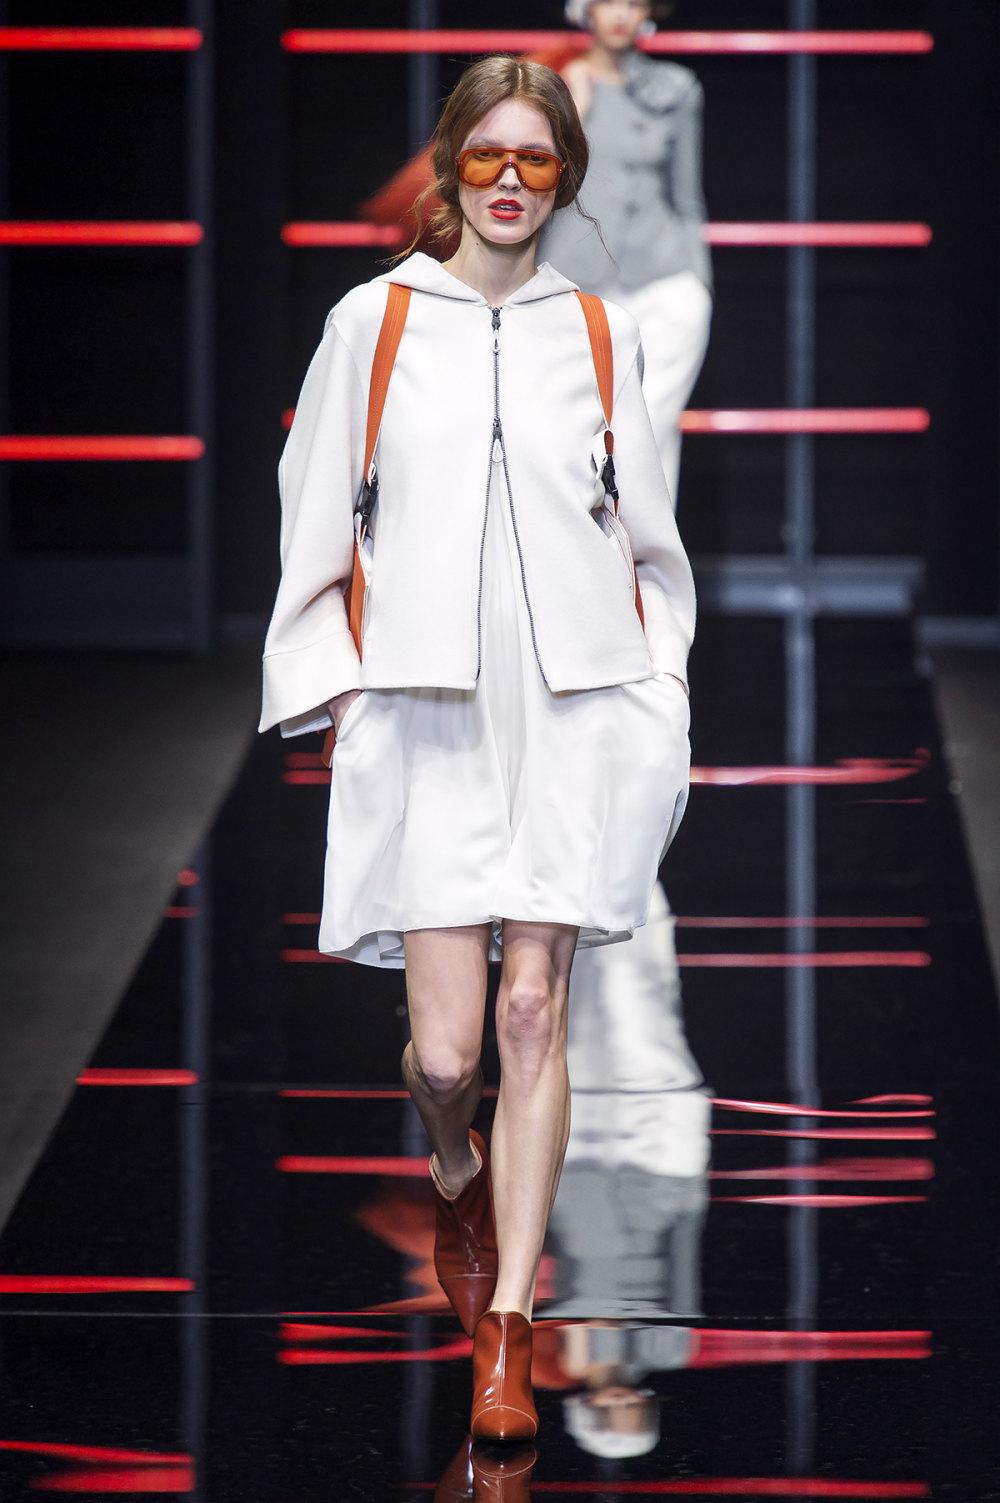 Emporio Armani时装系列畅的裤子带有柔滑裙子的鸡尾酒礼服-5.jpg